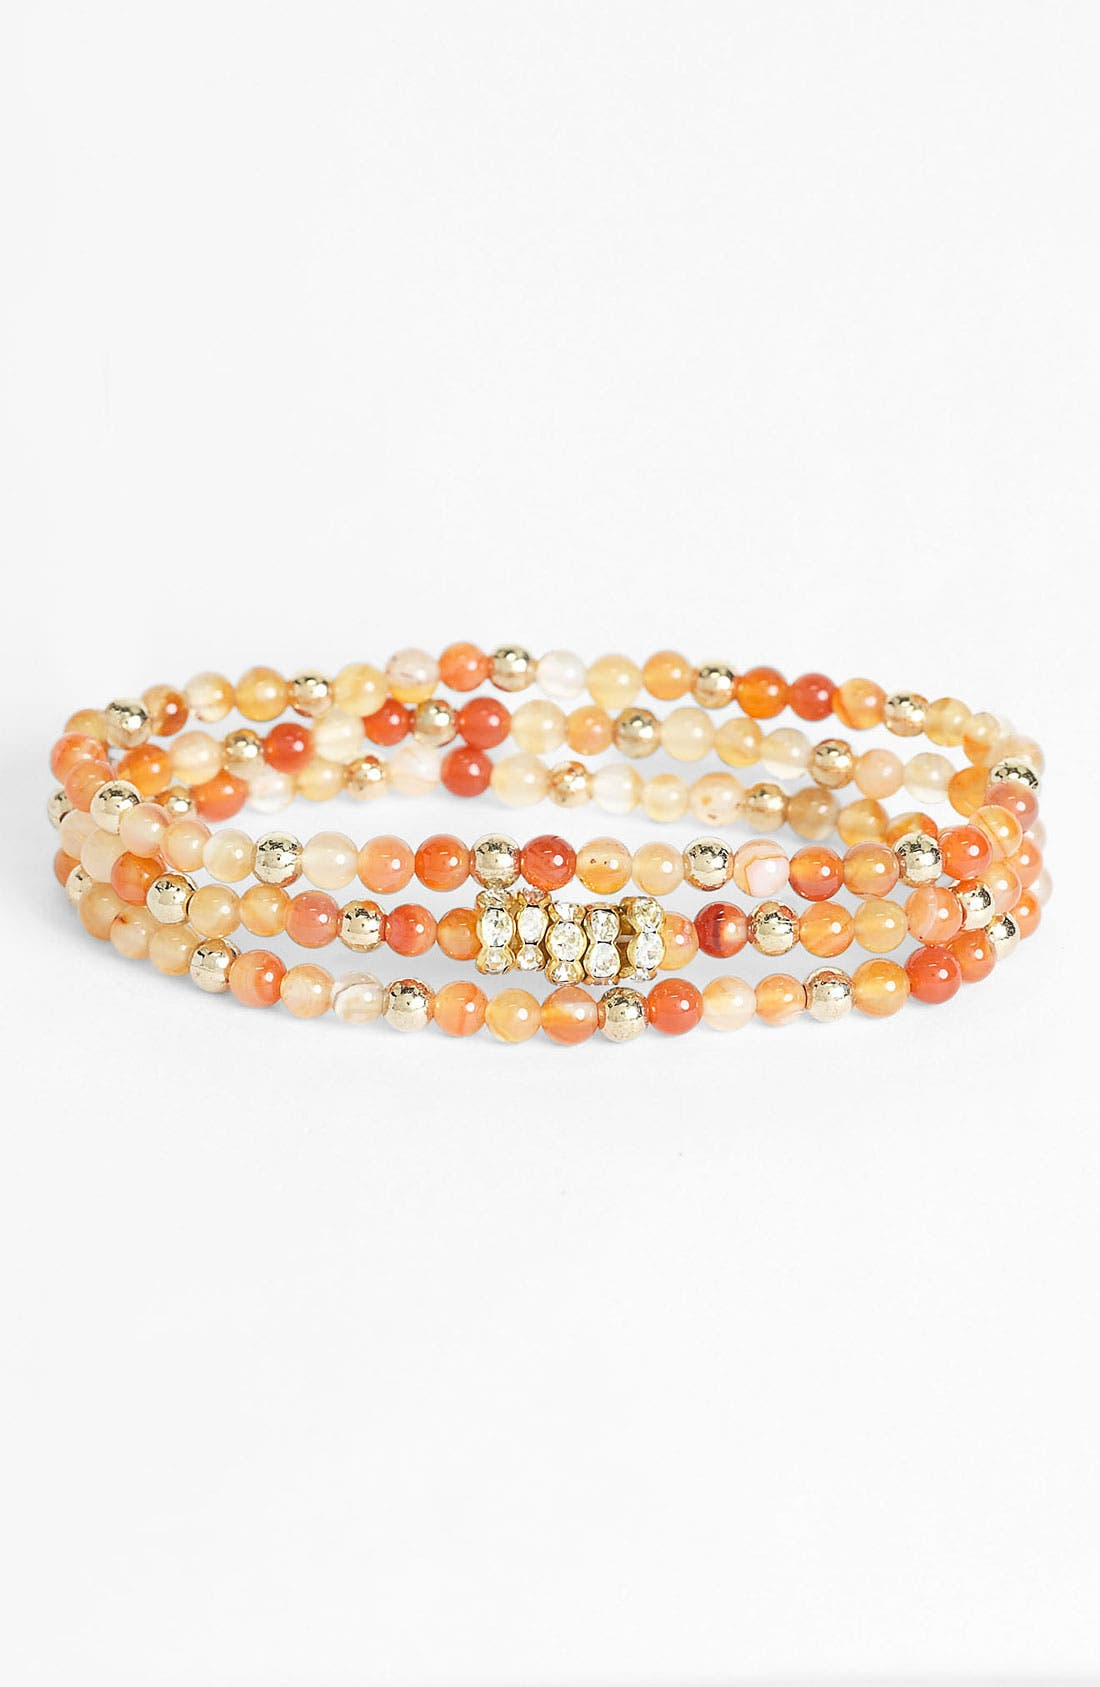 Alternate Image 1 Selected - Cara Bead Stretch Bracelets (Set of 3)